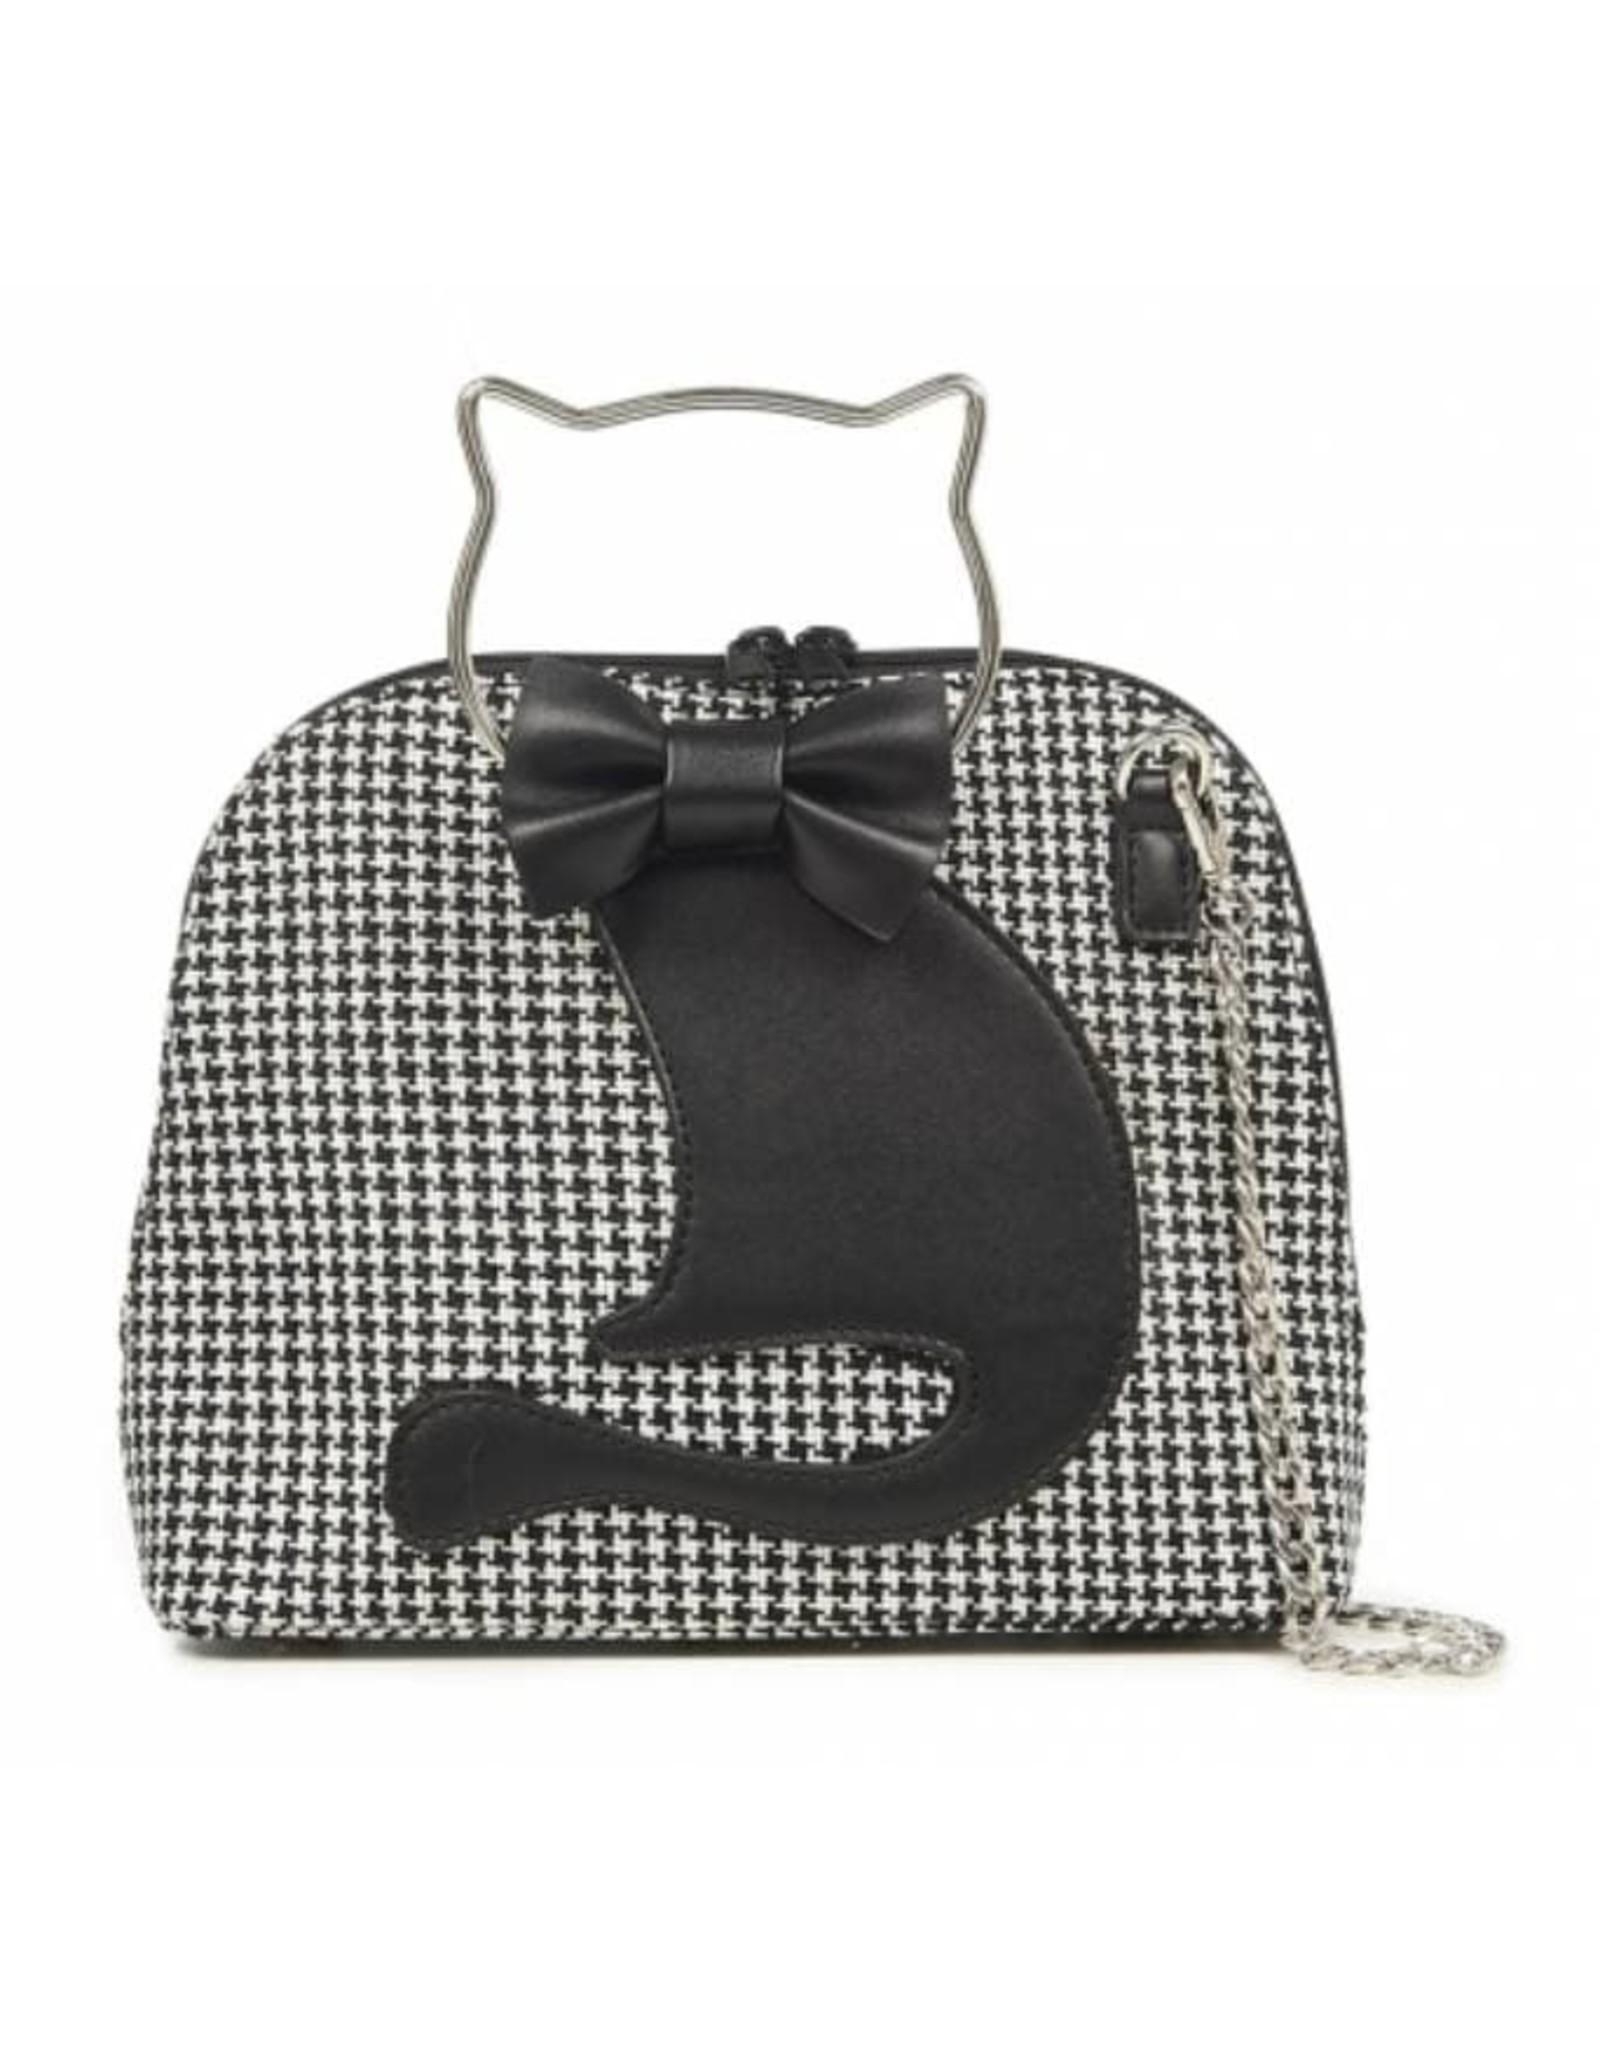 Vintage Vintage bags Retro bags - Banned Retro hand bag Dixie